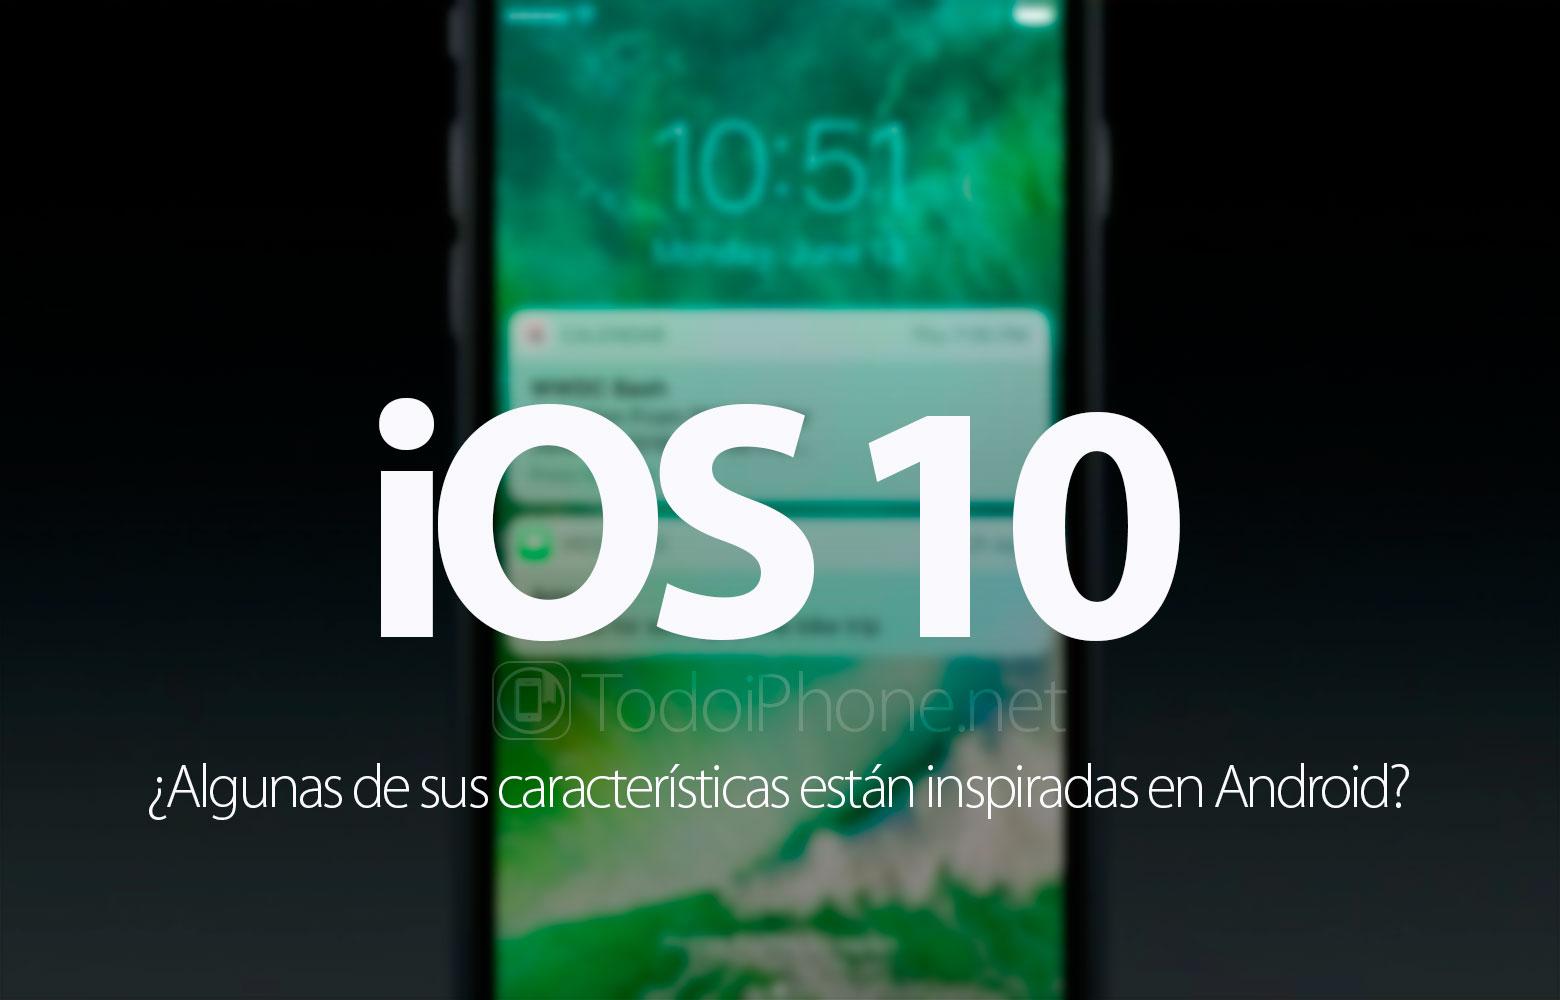 ios-10-caracteristicas-inspiradas-android